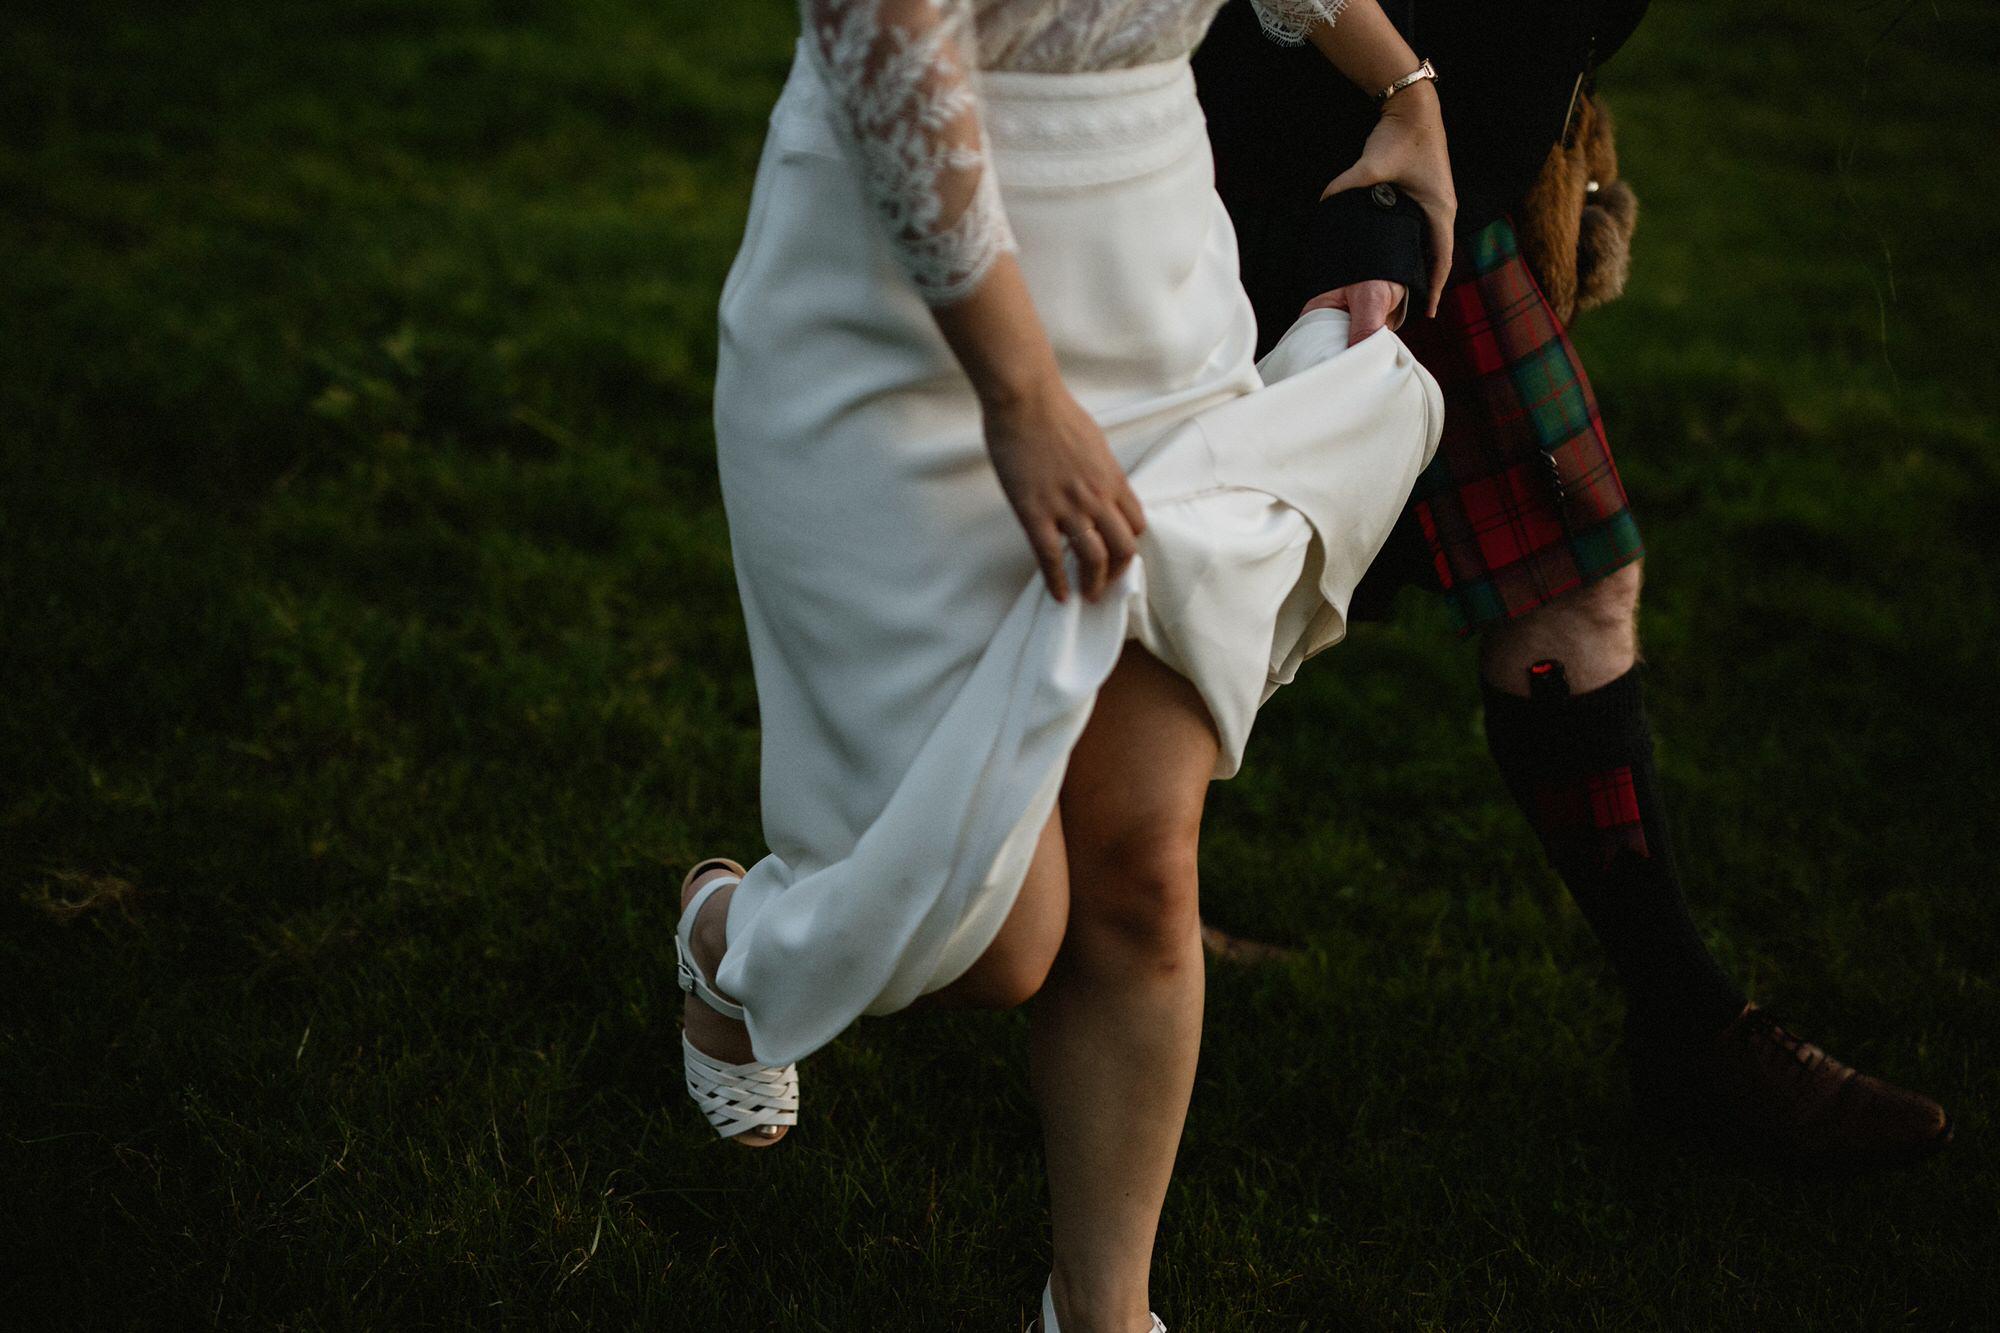 064 TIN SHED KNOCKRAICH WEDDING AUTUMN ZOE ALEXANDRA PHOTOGRAPHY